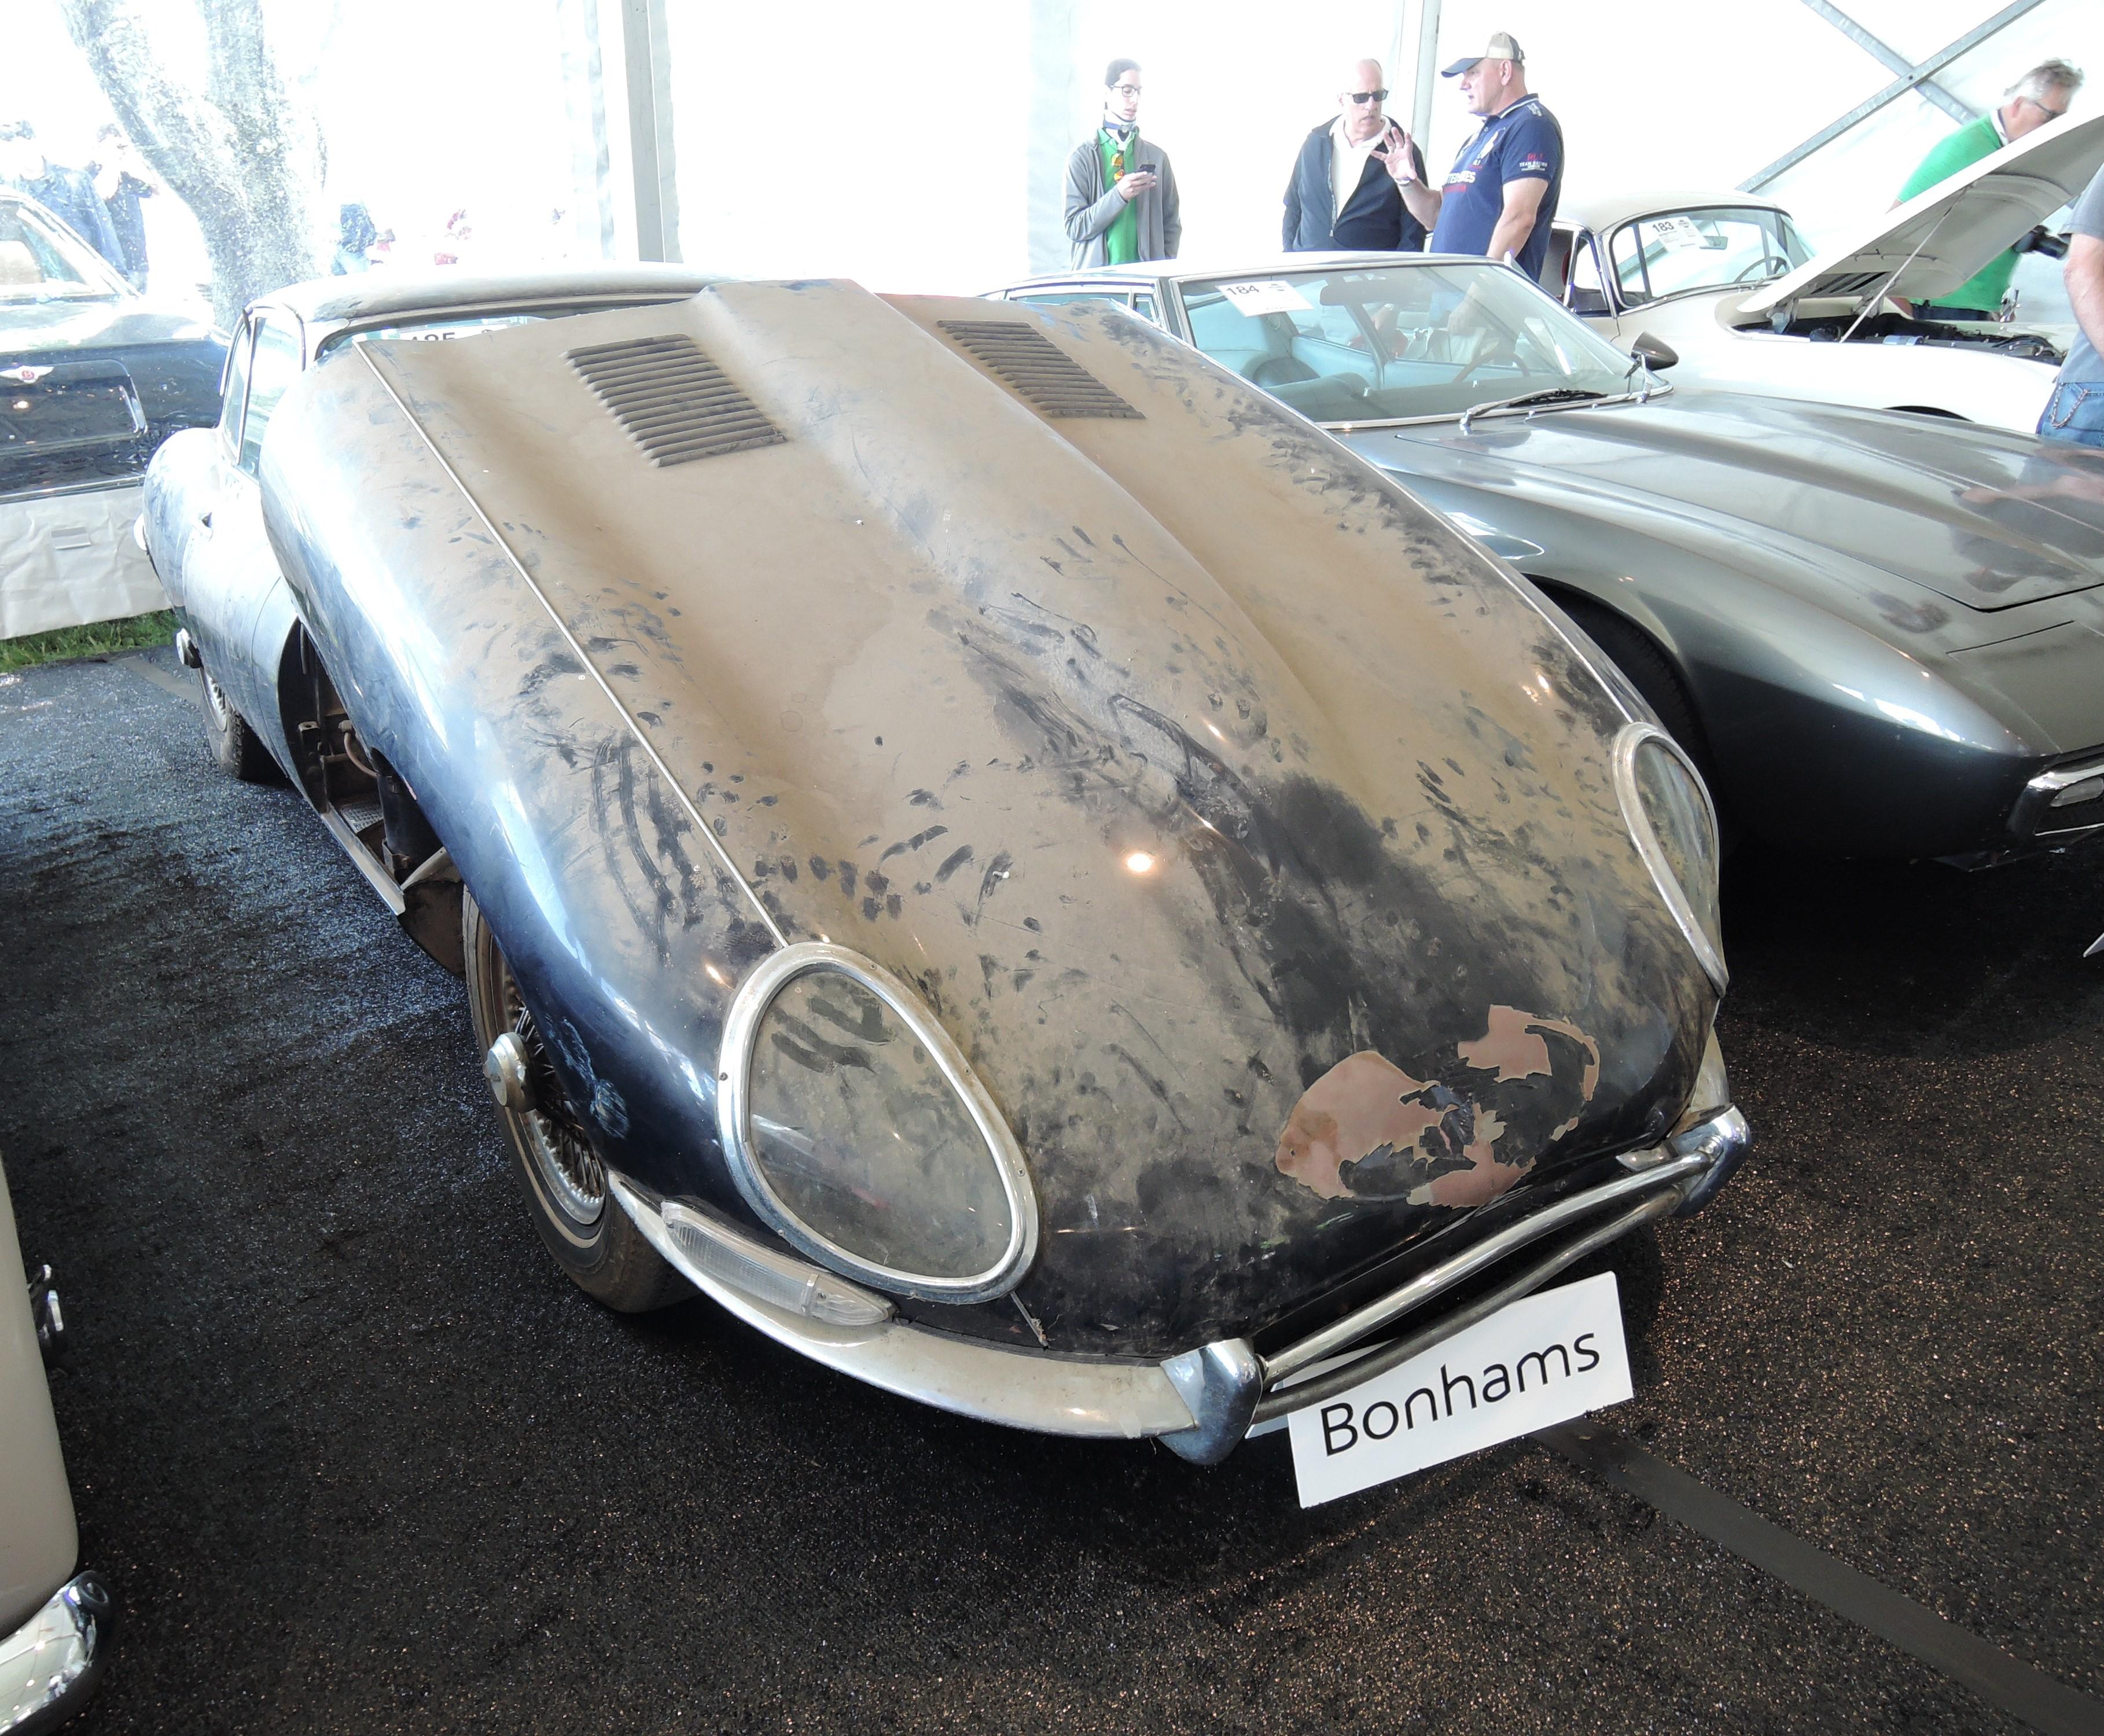 bonhams dark blue 1965 Jaguar E-Type Series I 4.2 Fixed Head Coupe - Greenwich Concours d'Elegance 2017